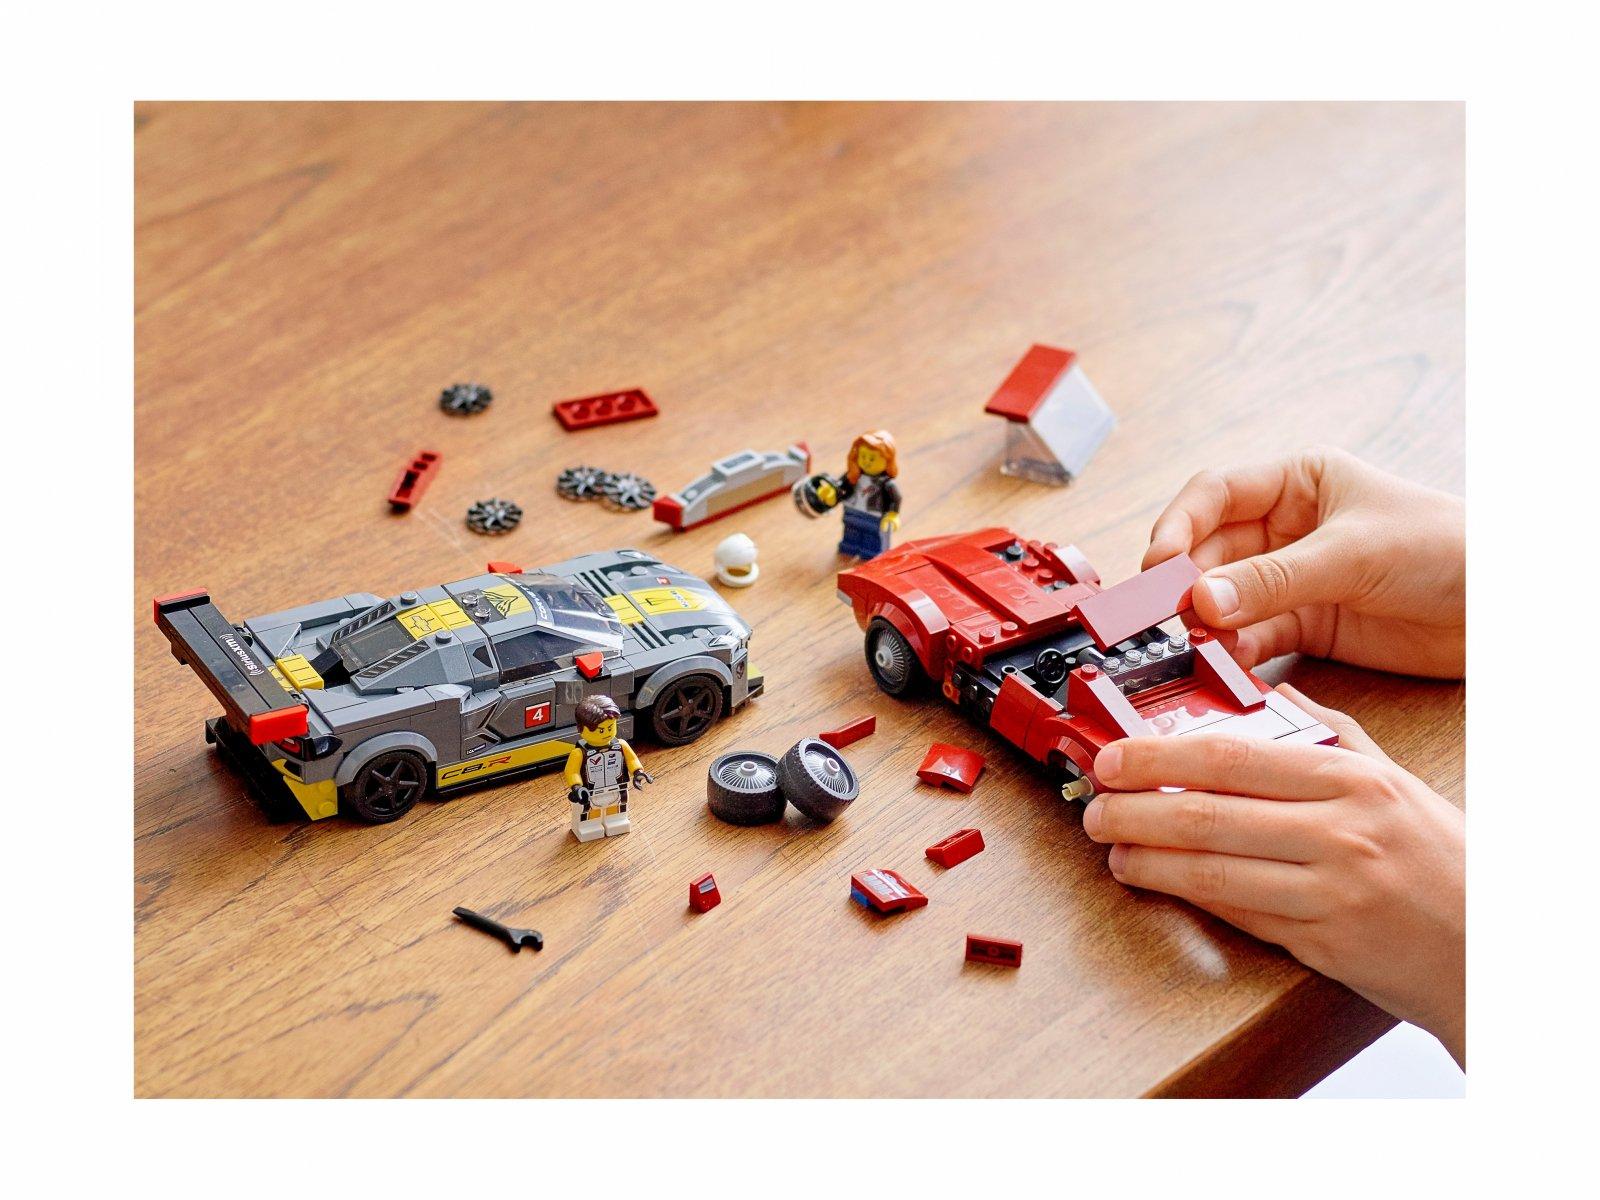 LEGO 76903 Speed Champions Samochód wyścigowy Chevrolet Corvette C8.R i 1968 Chevrolet Corv